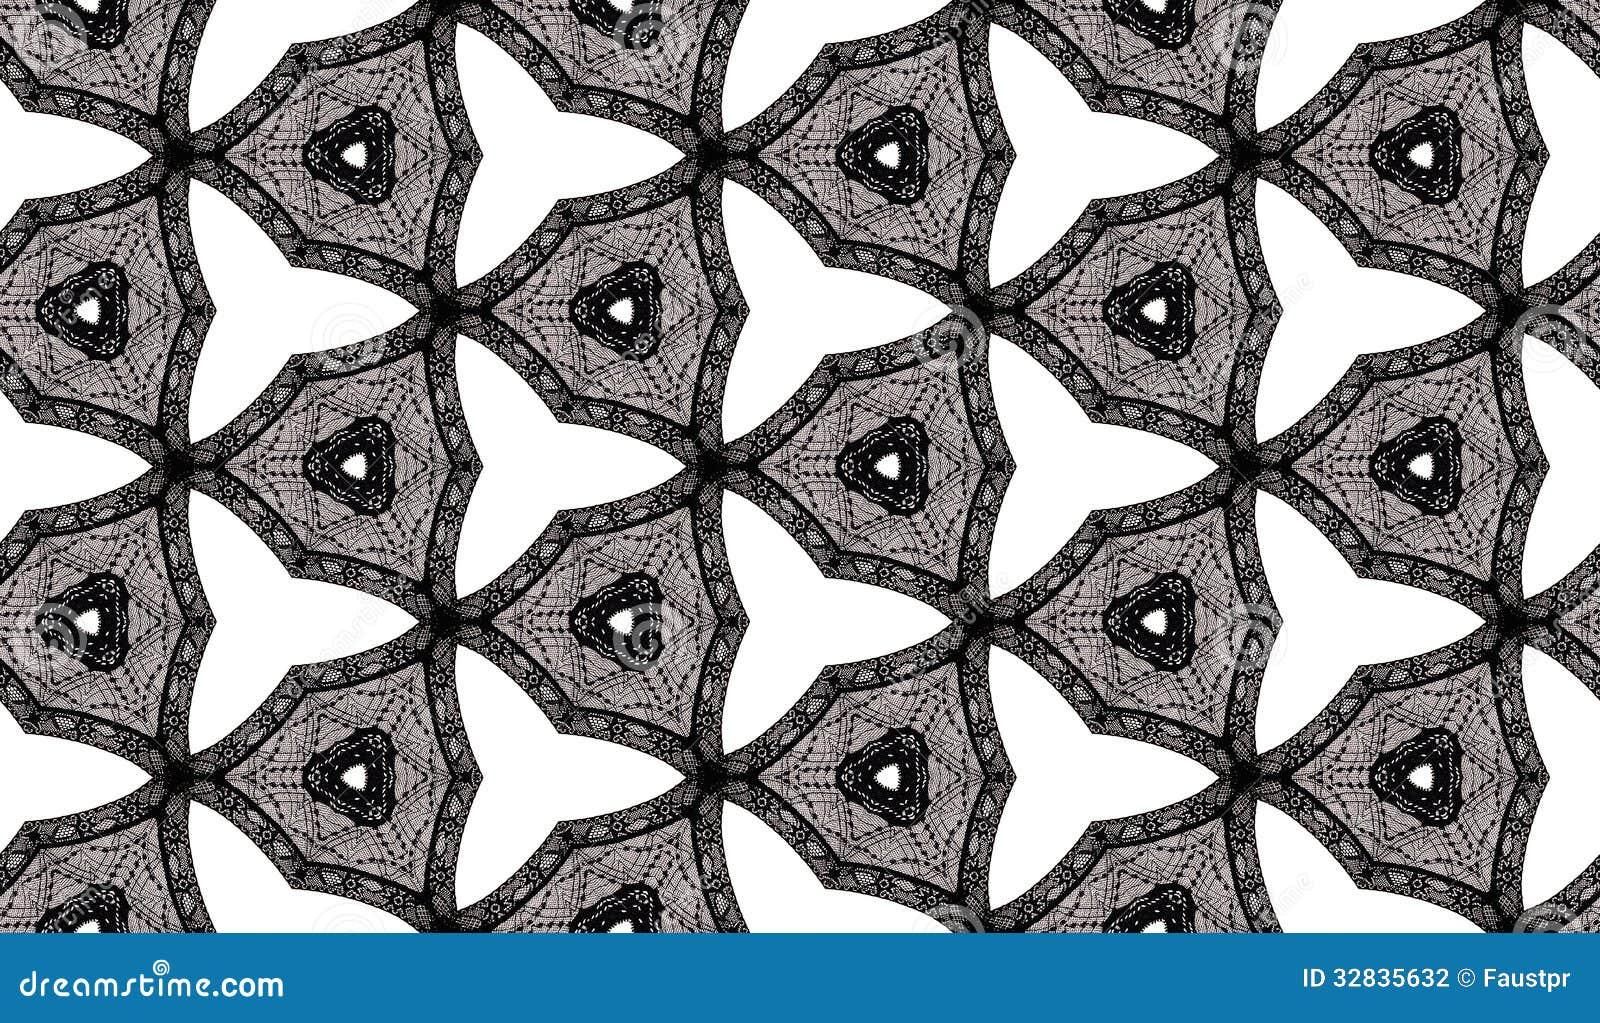 lace background tile - photo #42